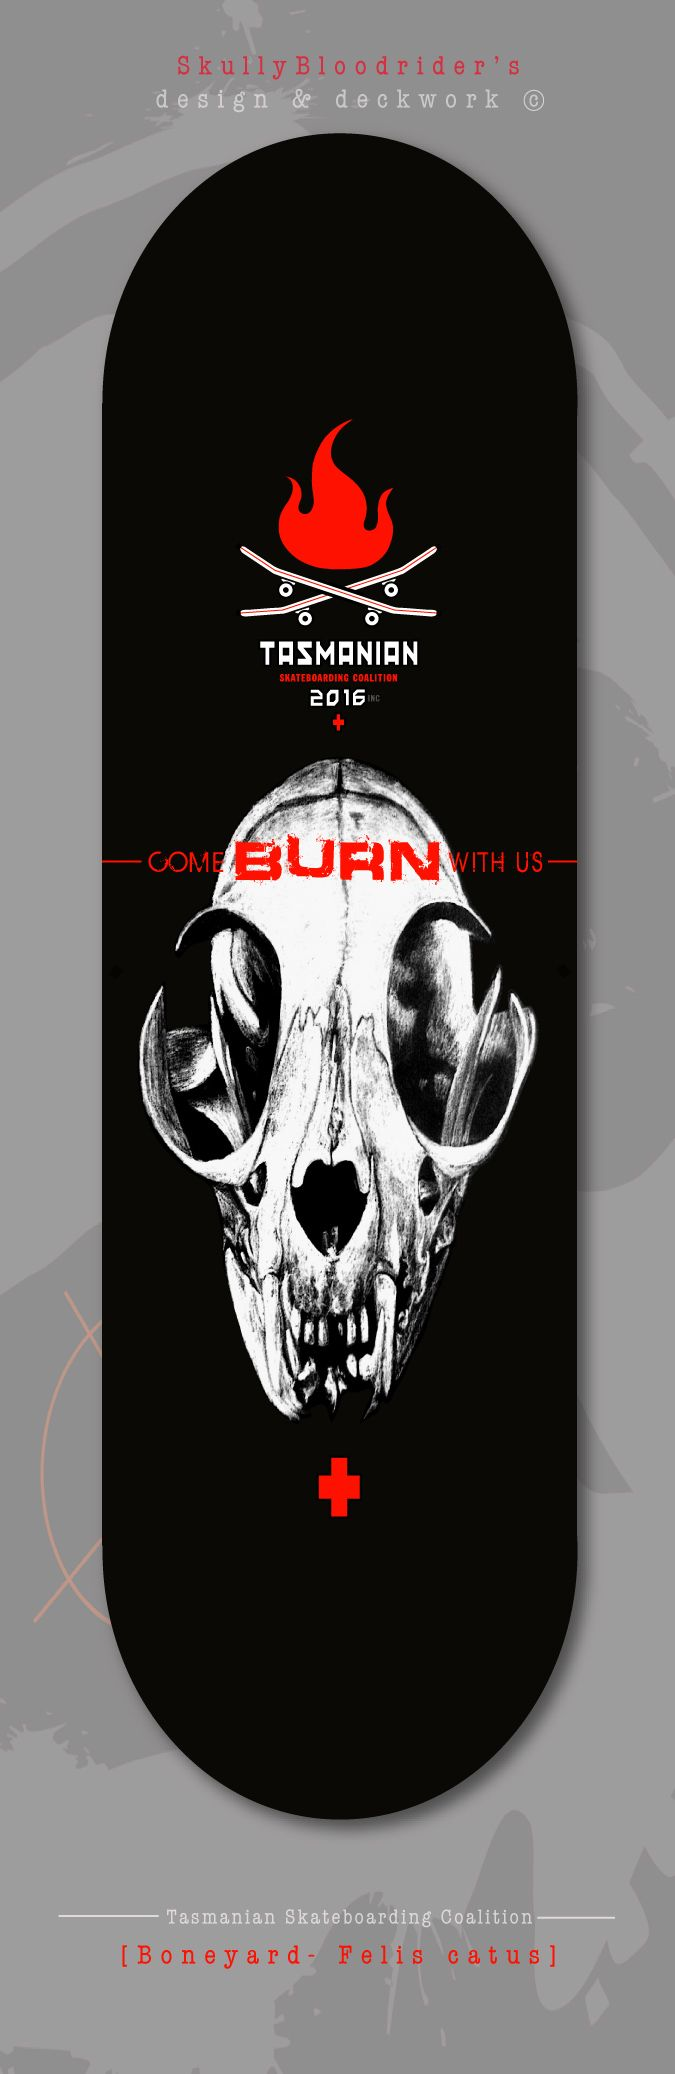 'Boneyard' - Felis catus... deck design, this series is all about life, death & skulls. illustration by: Veronikeehl. Get onboard  Skullybloodrider 4.5.2016.